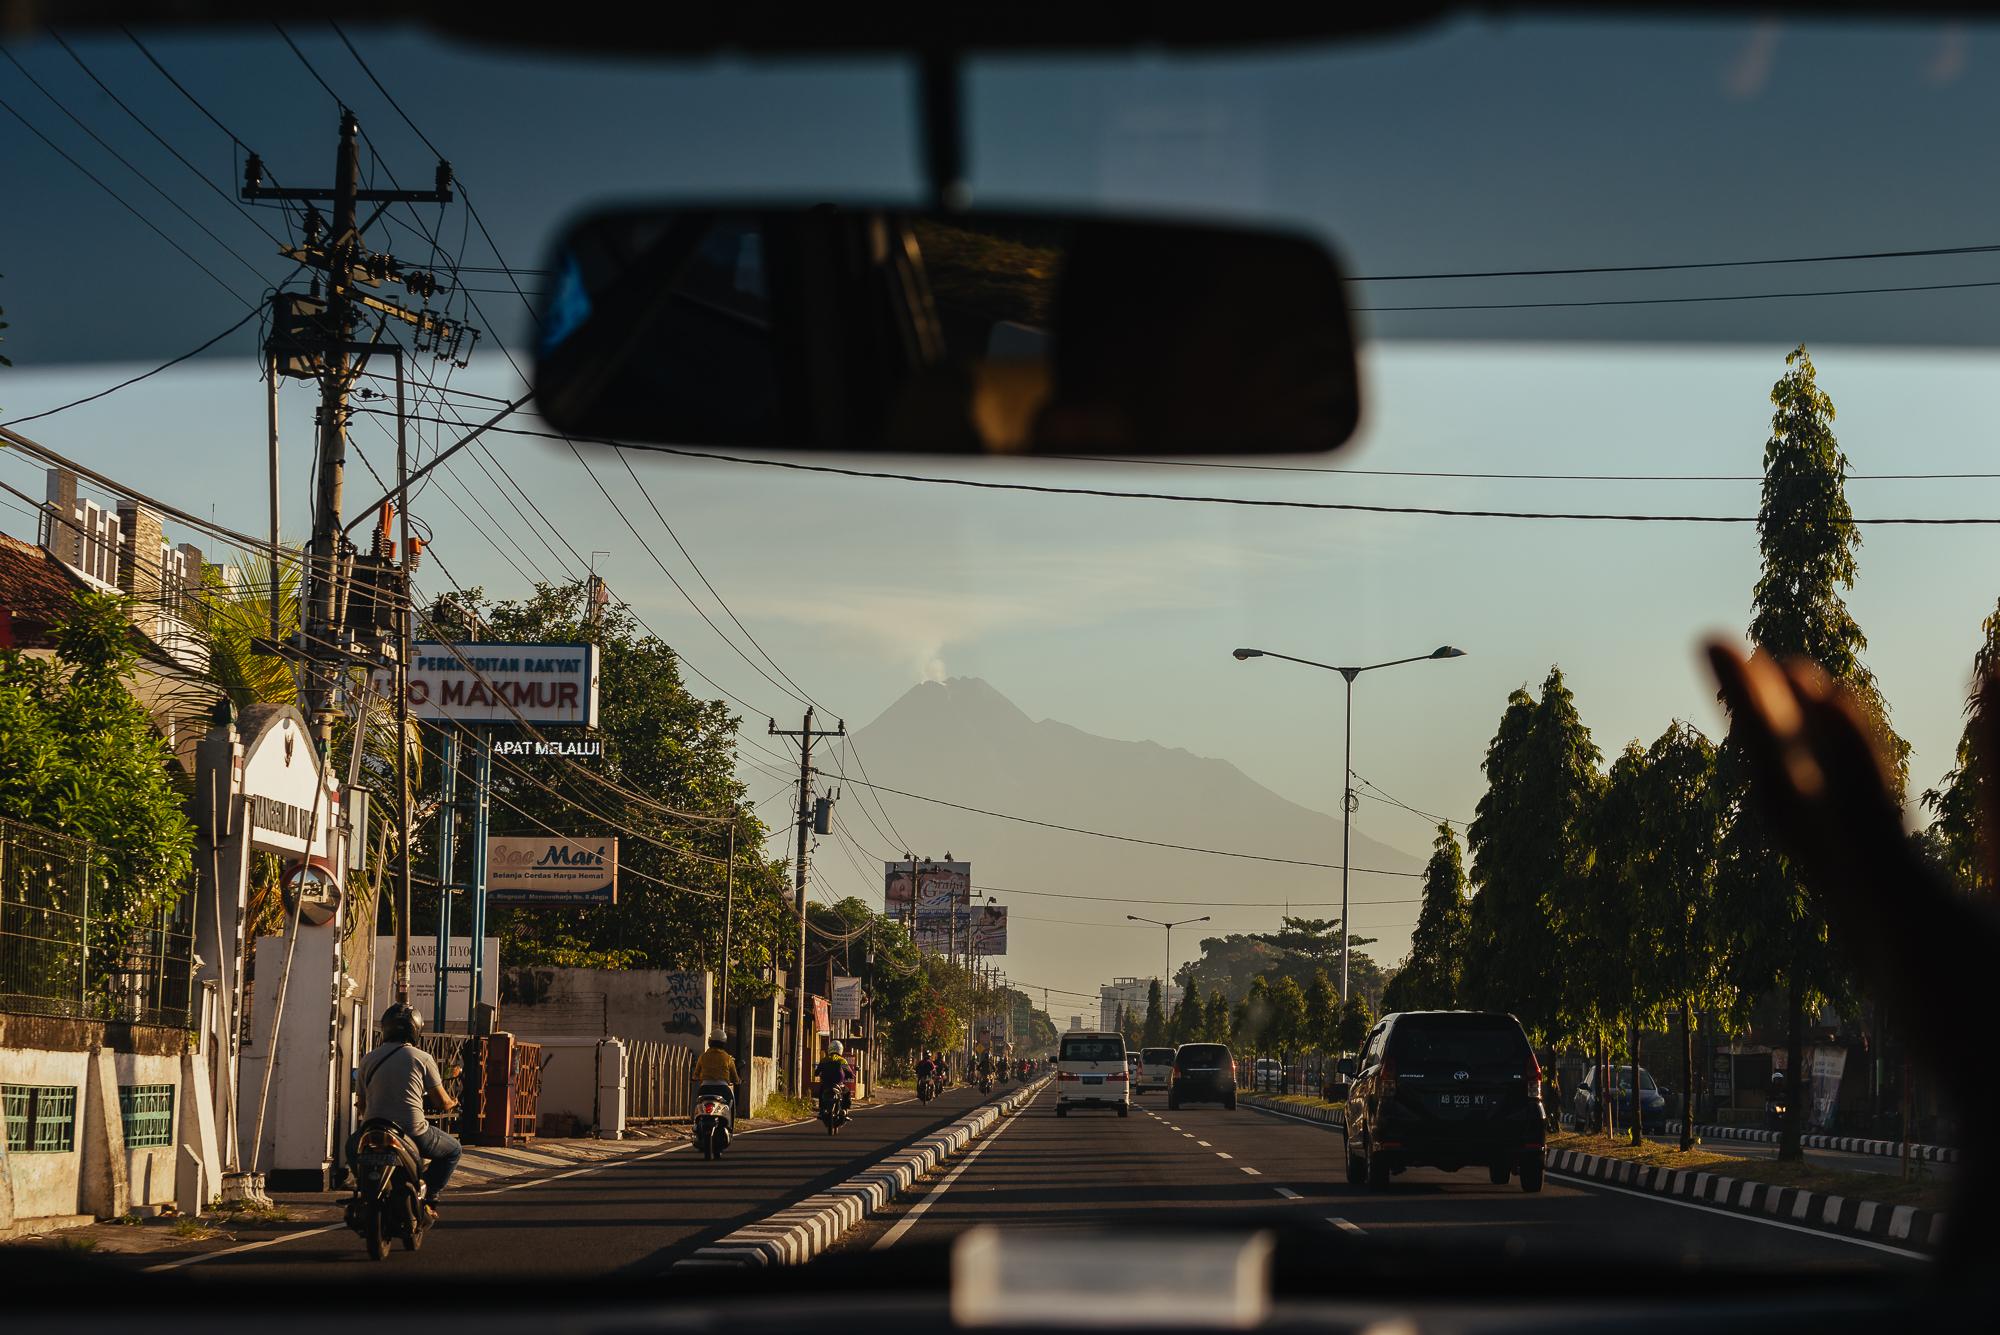 indonesia_2017-1015.jpg